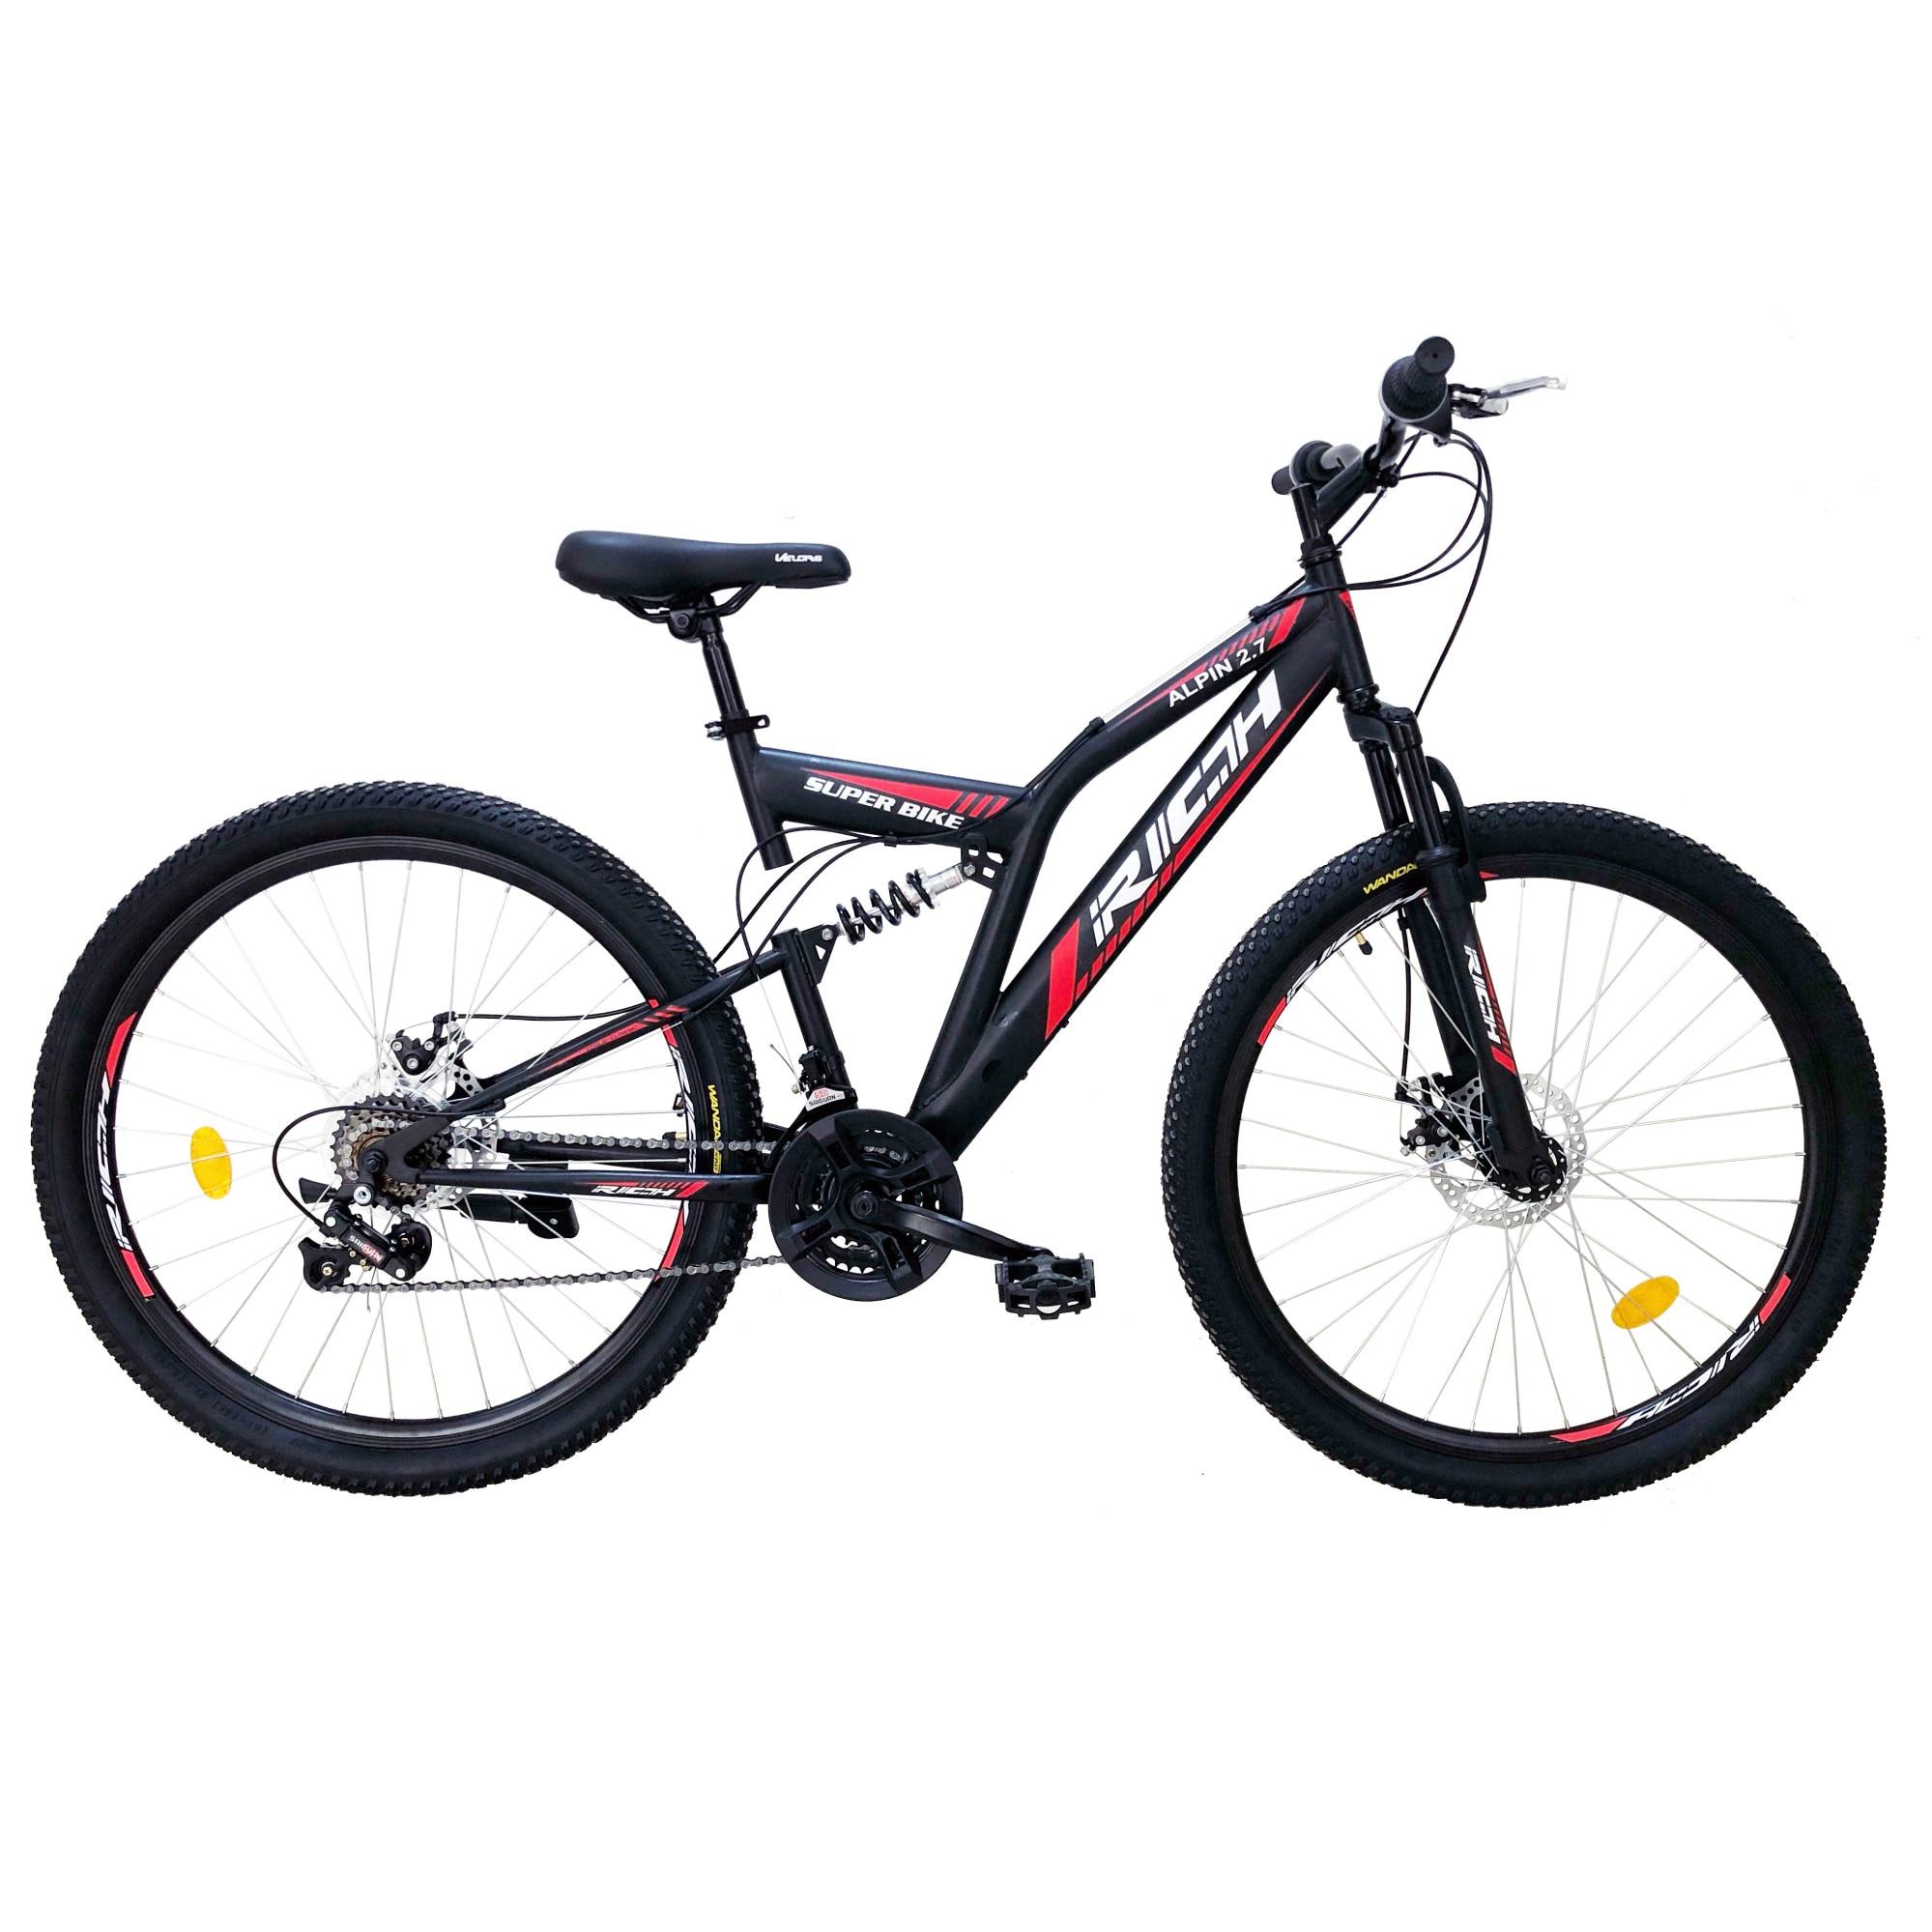 "Fotografie Bicicleta MTB Rich 27.5"" R2750D FS, Negru/Alb/Rosu"